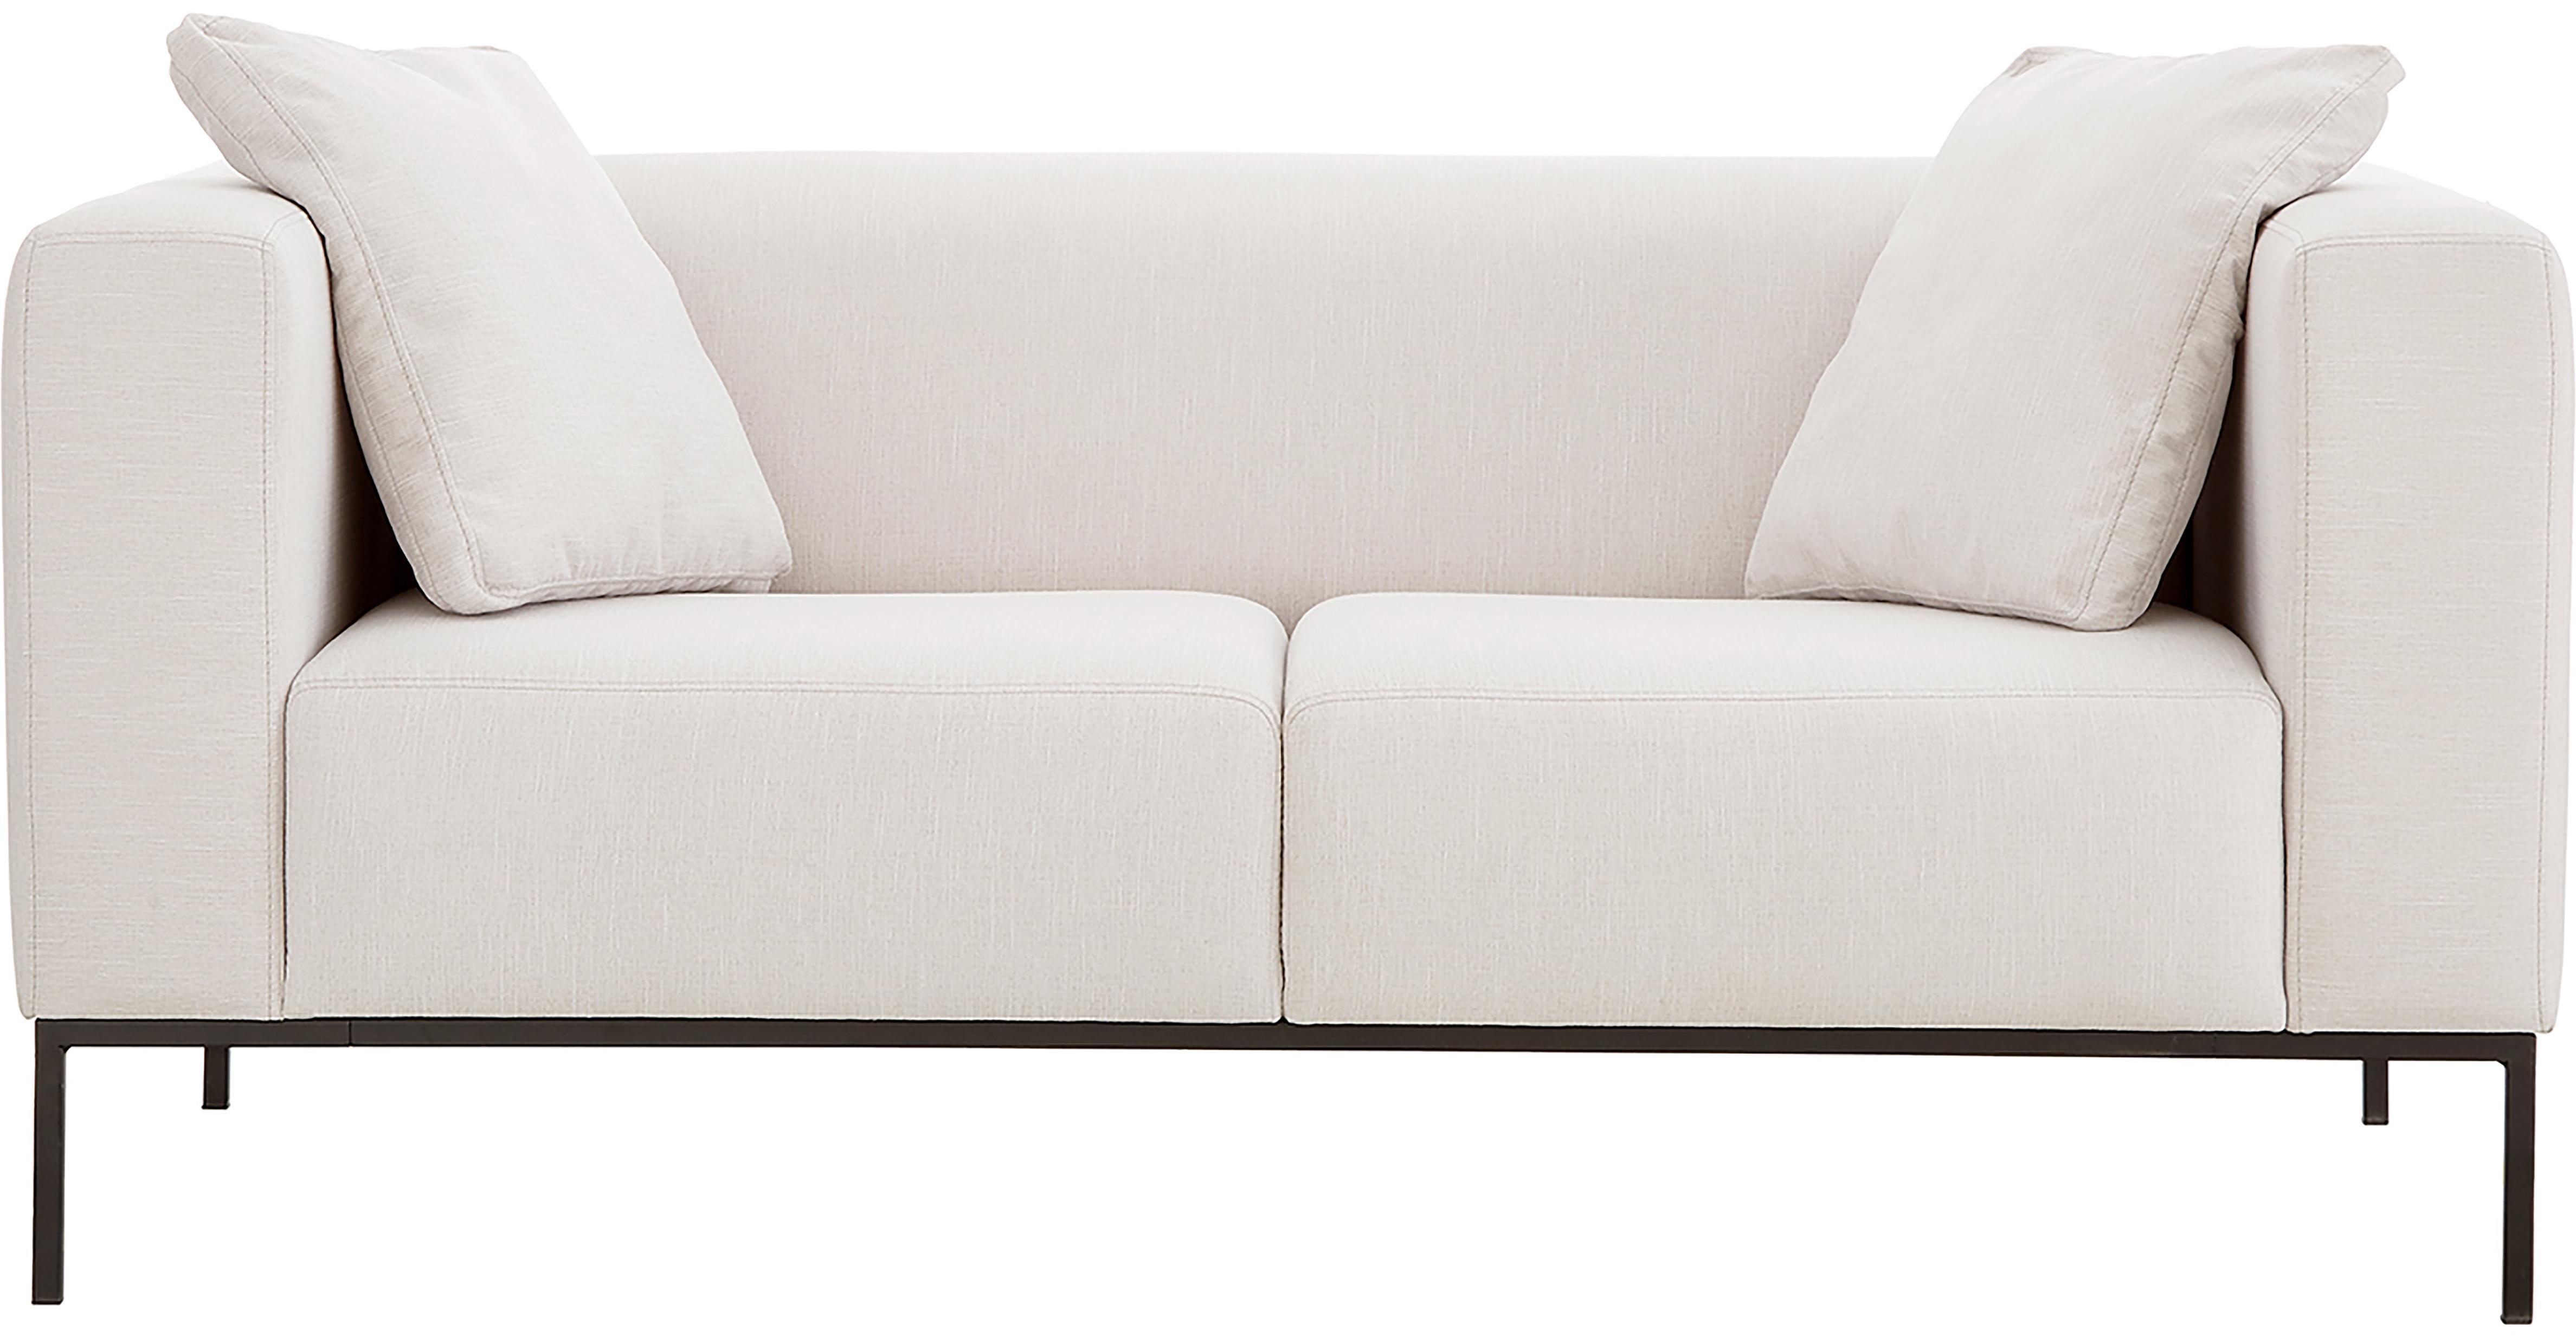 Bank Carrie (2-zits), Bekleding: polyester, Frame: spaanplaat, hardboard, mu, Poten: gelakt metaal, Webstoff Beige, B 176 x D 86 cm